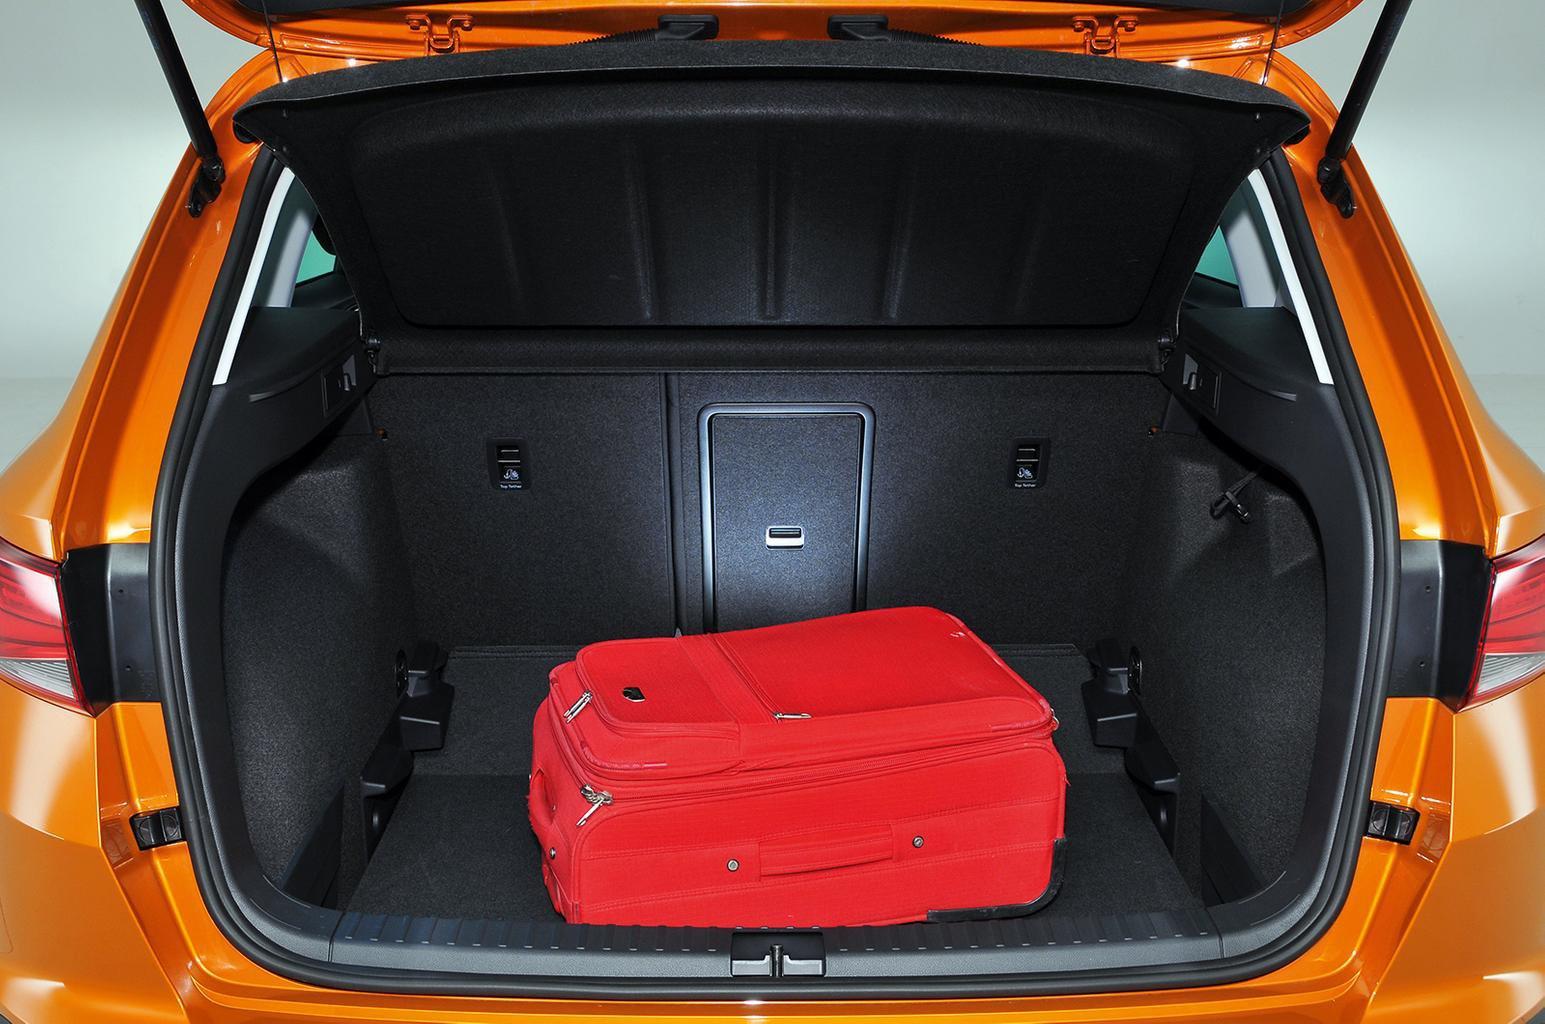 Used Seat Ateca 16-present